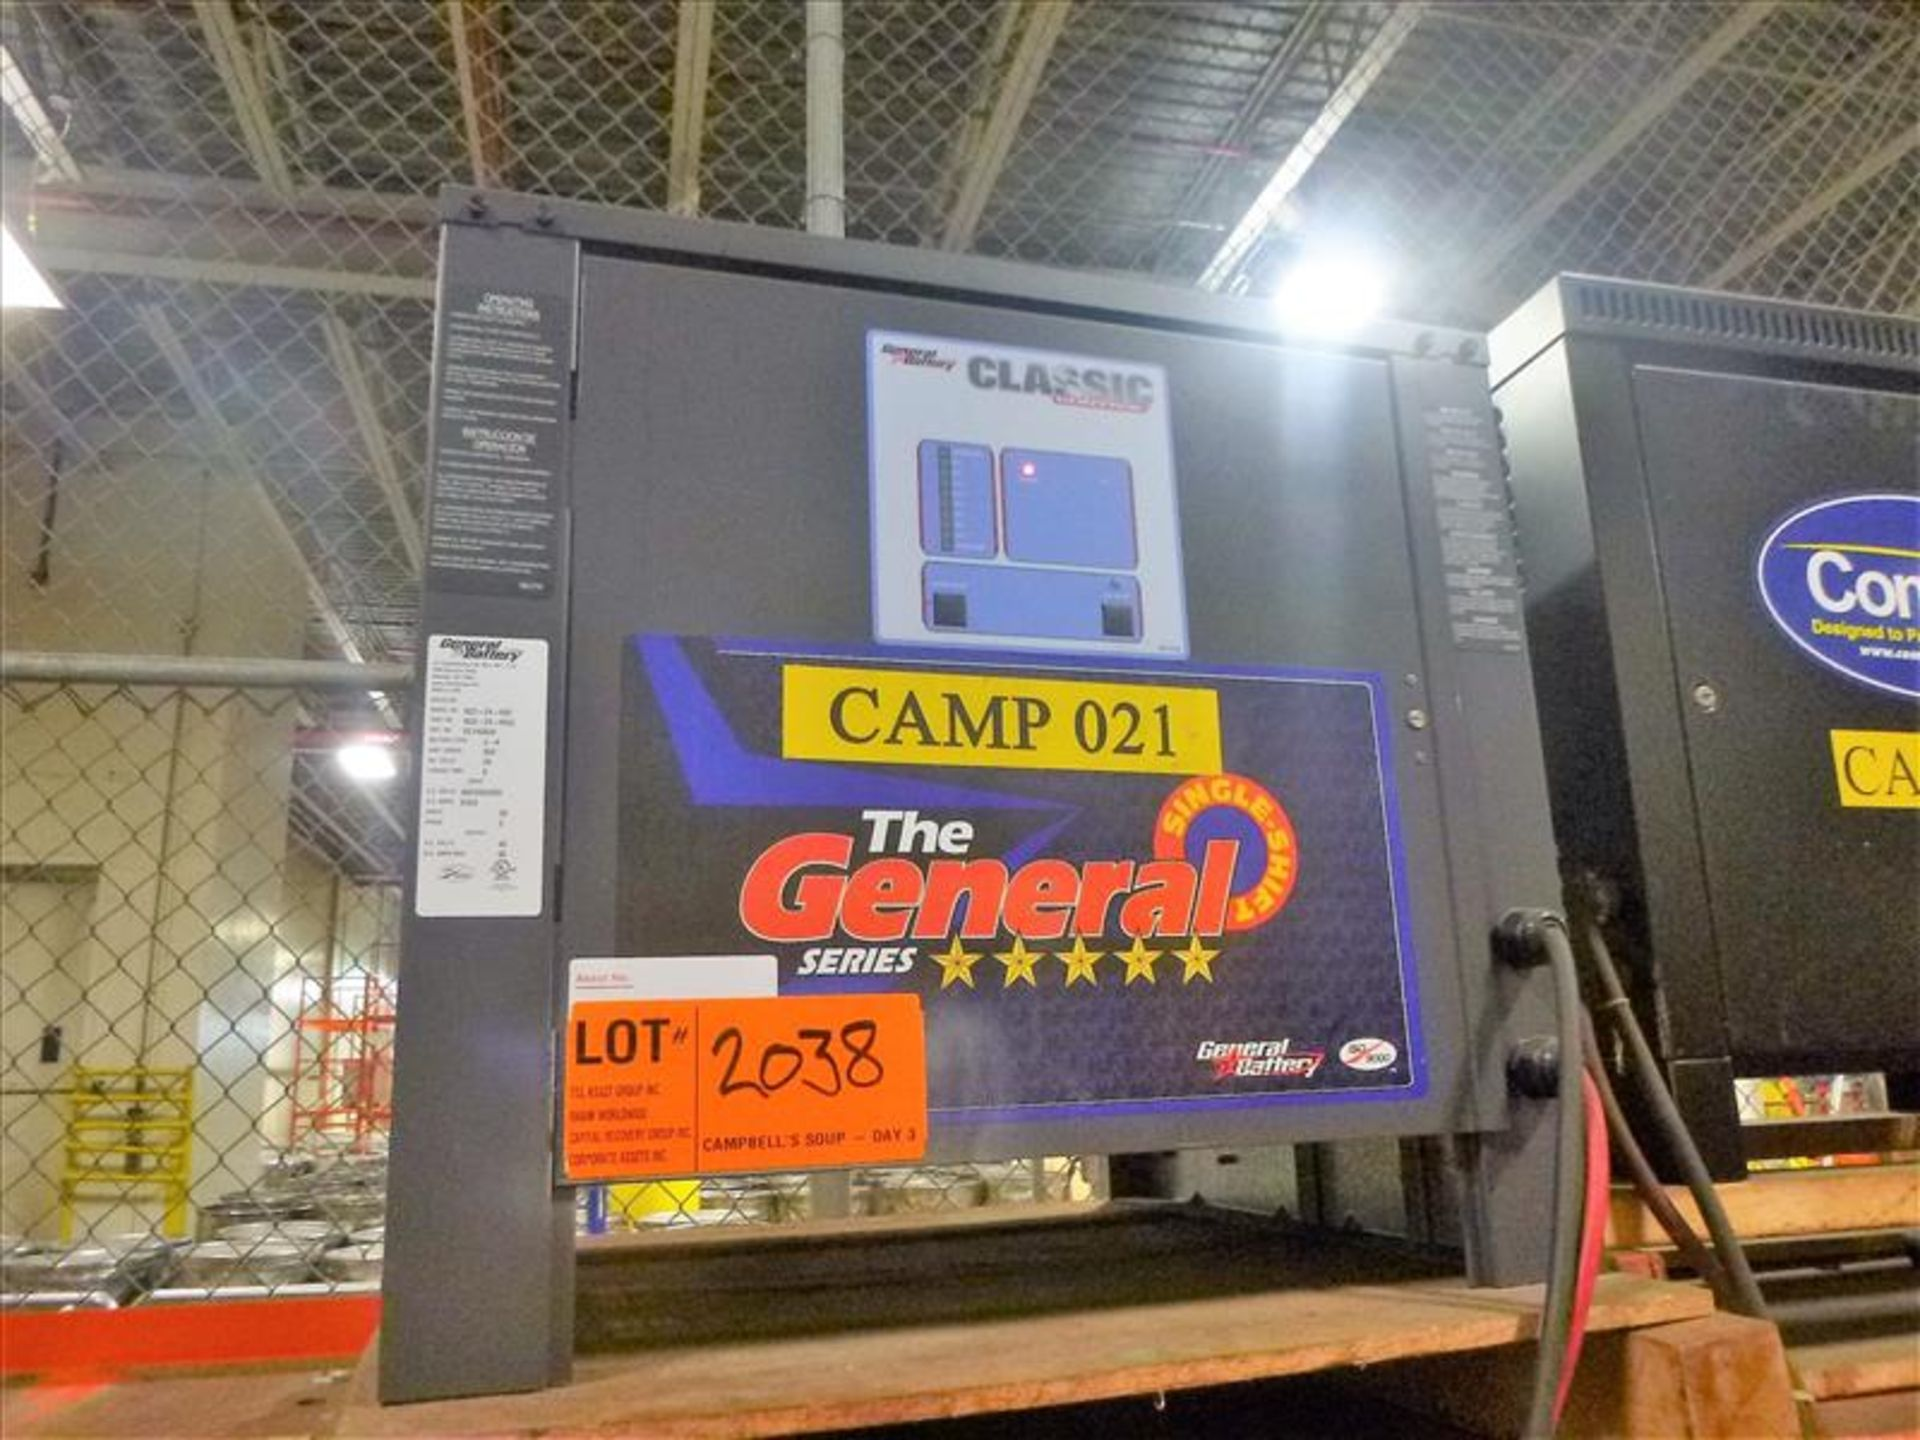 General battery charger, 48V [Material Handling]